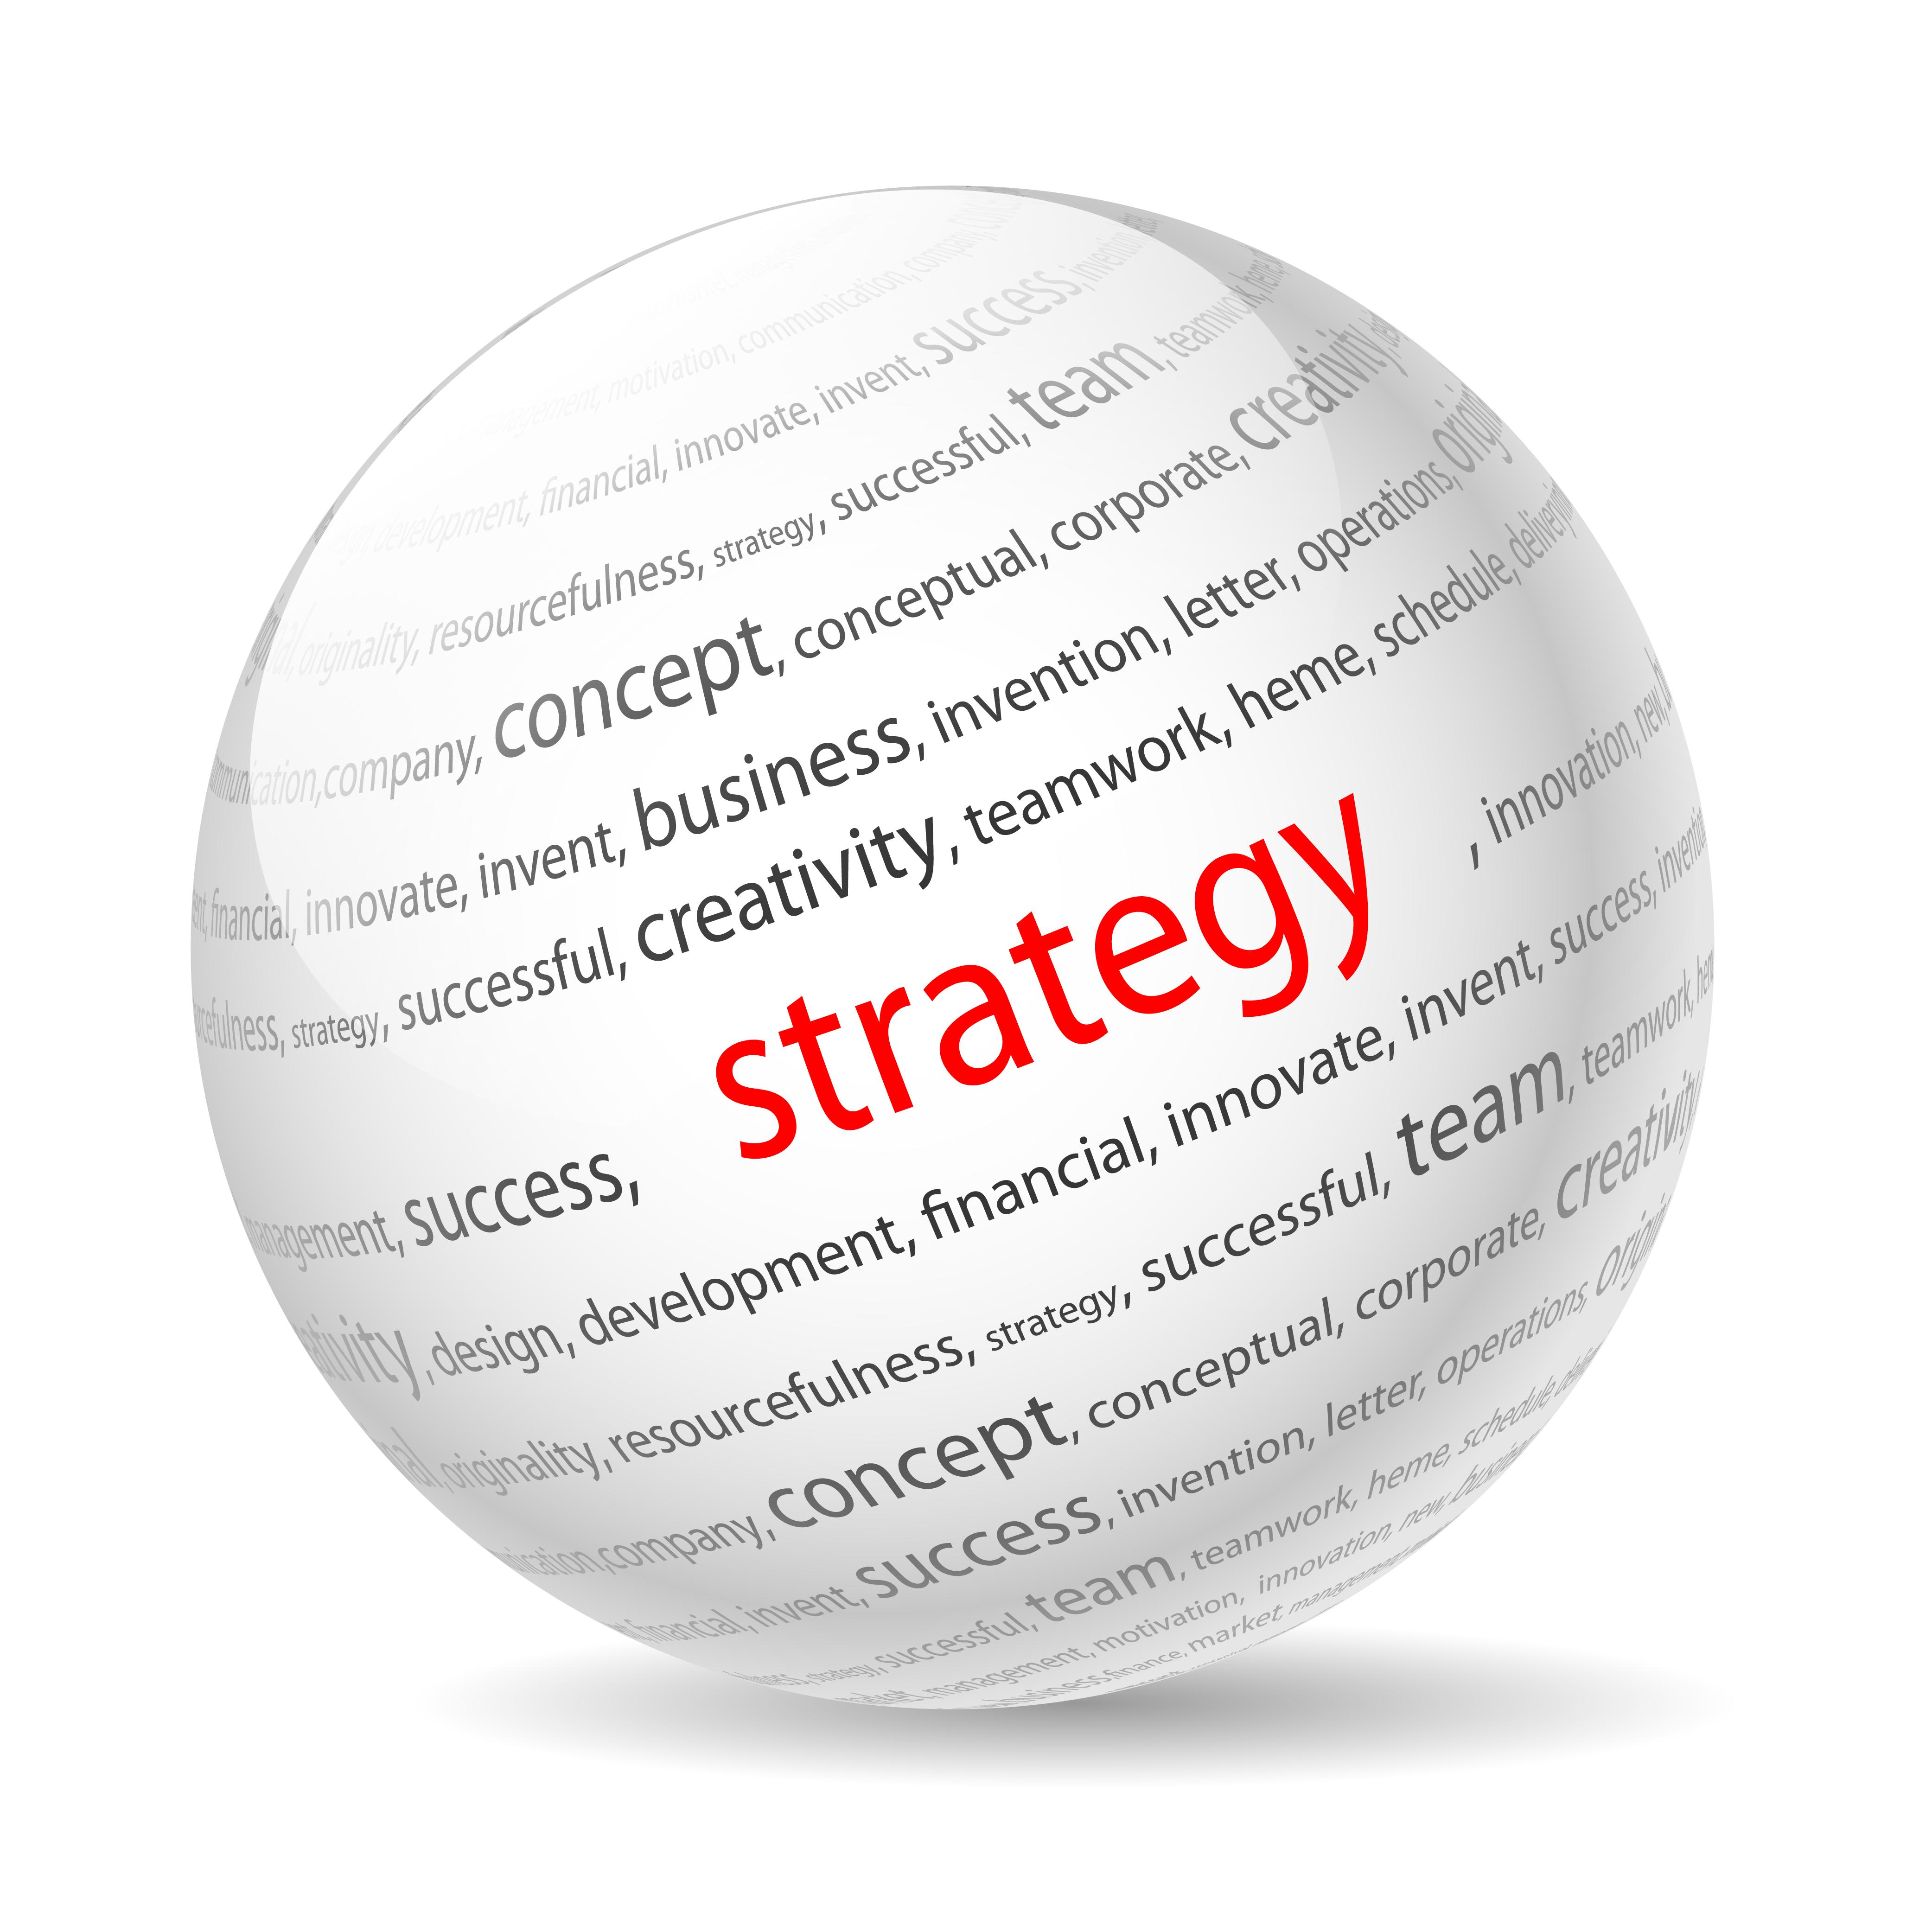 StrategyGlobe